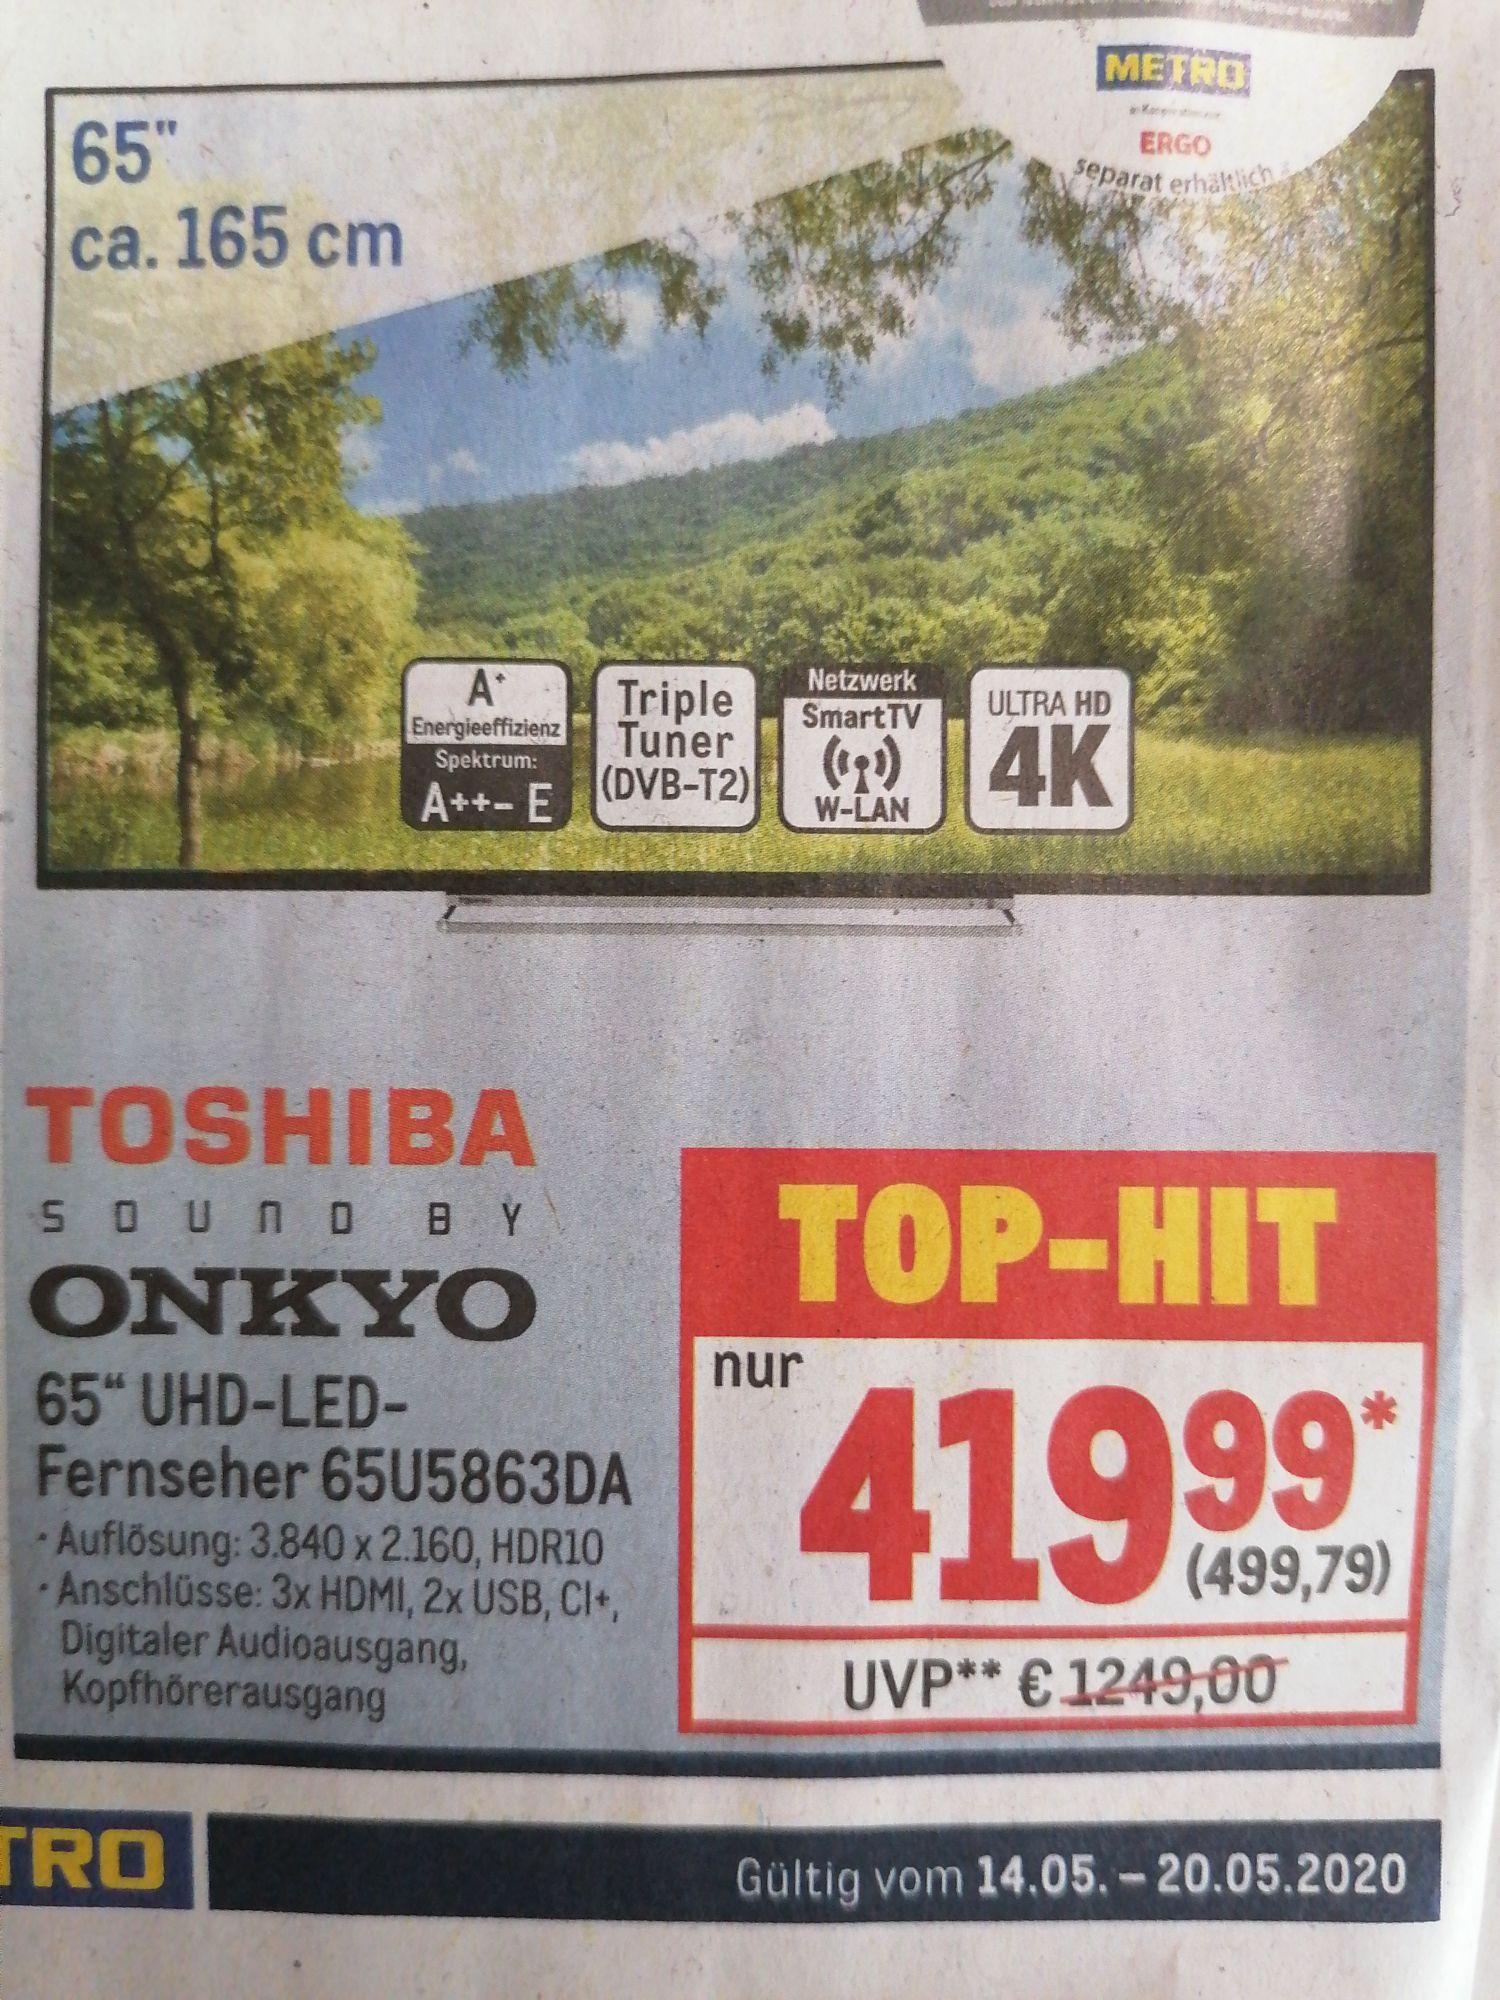 [Metro] Toshiba 65 Zoll 4K UHD - LED - Fernseher 65U5863DA mit Onkyo Sound